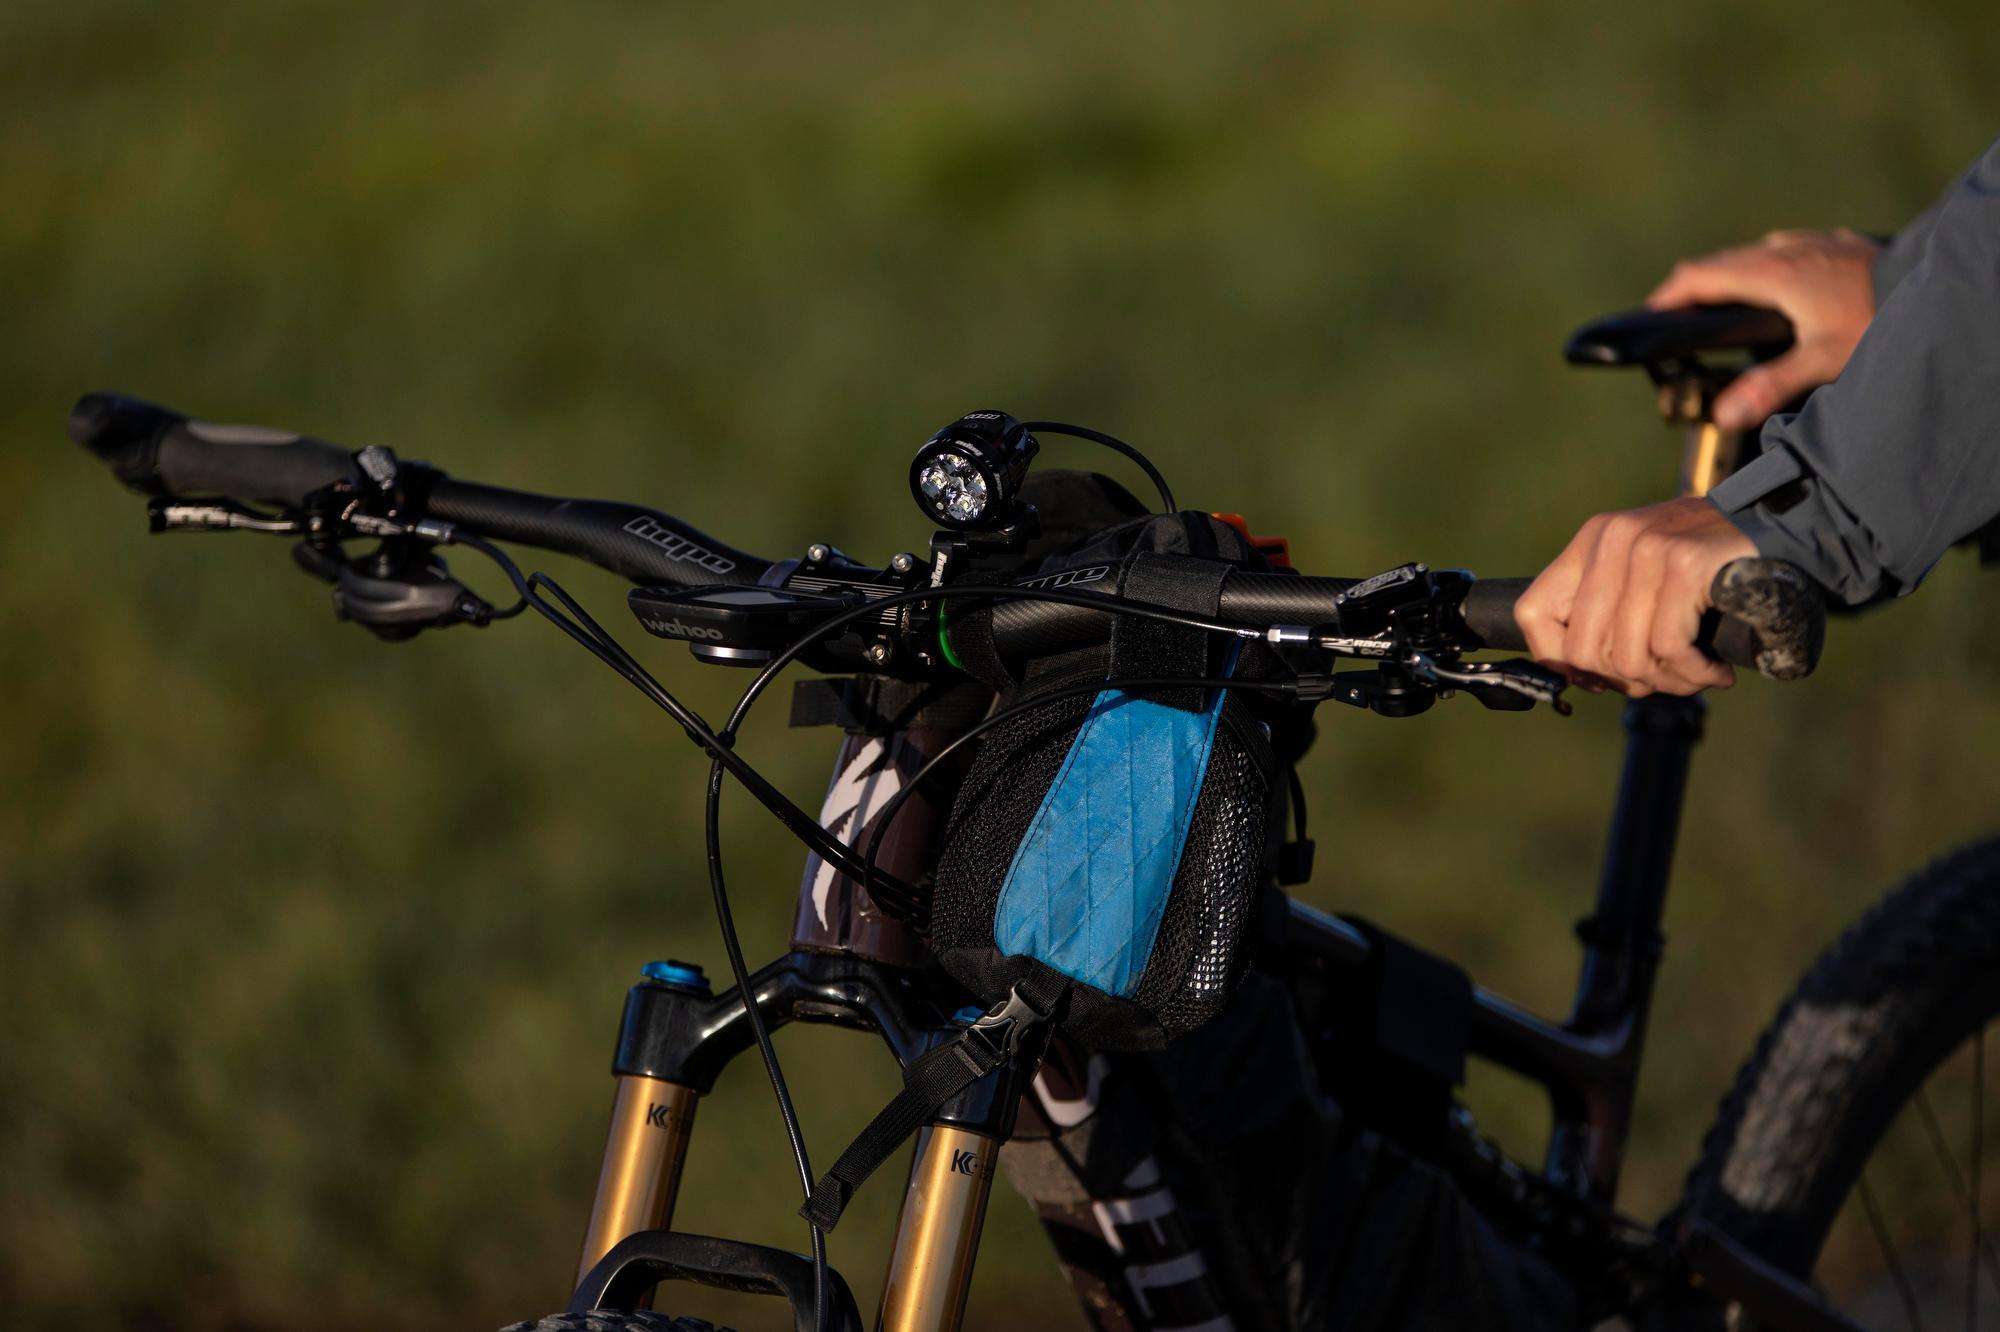 Lael Wilcox Kenai 250 Bike & Gear 028